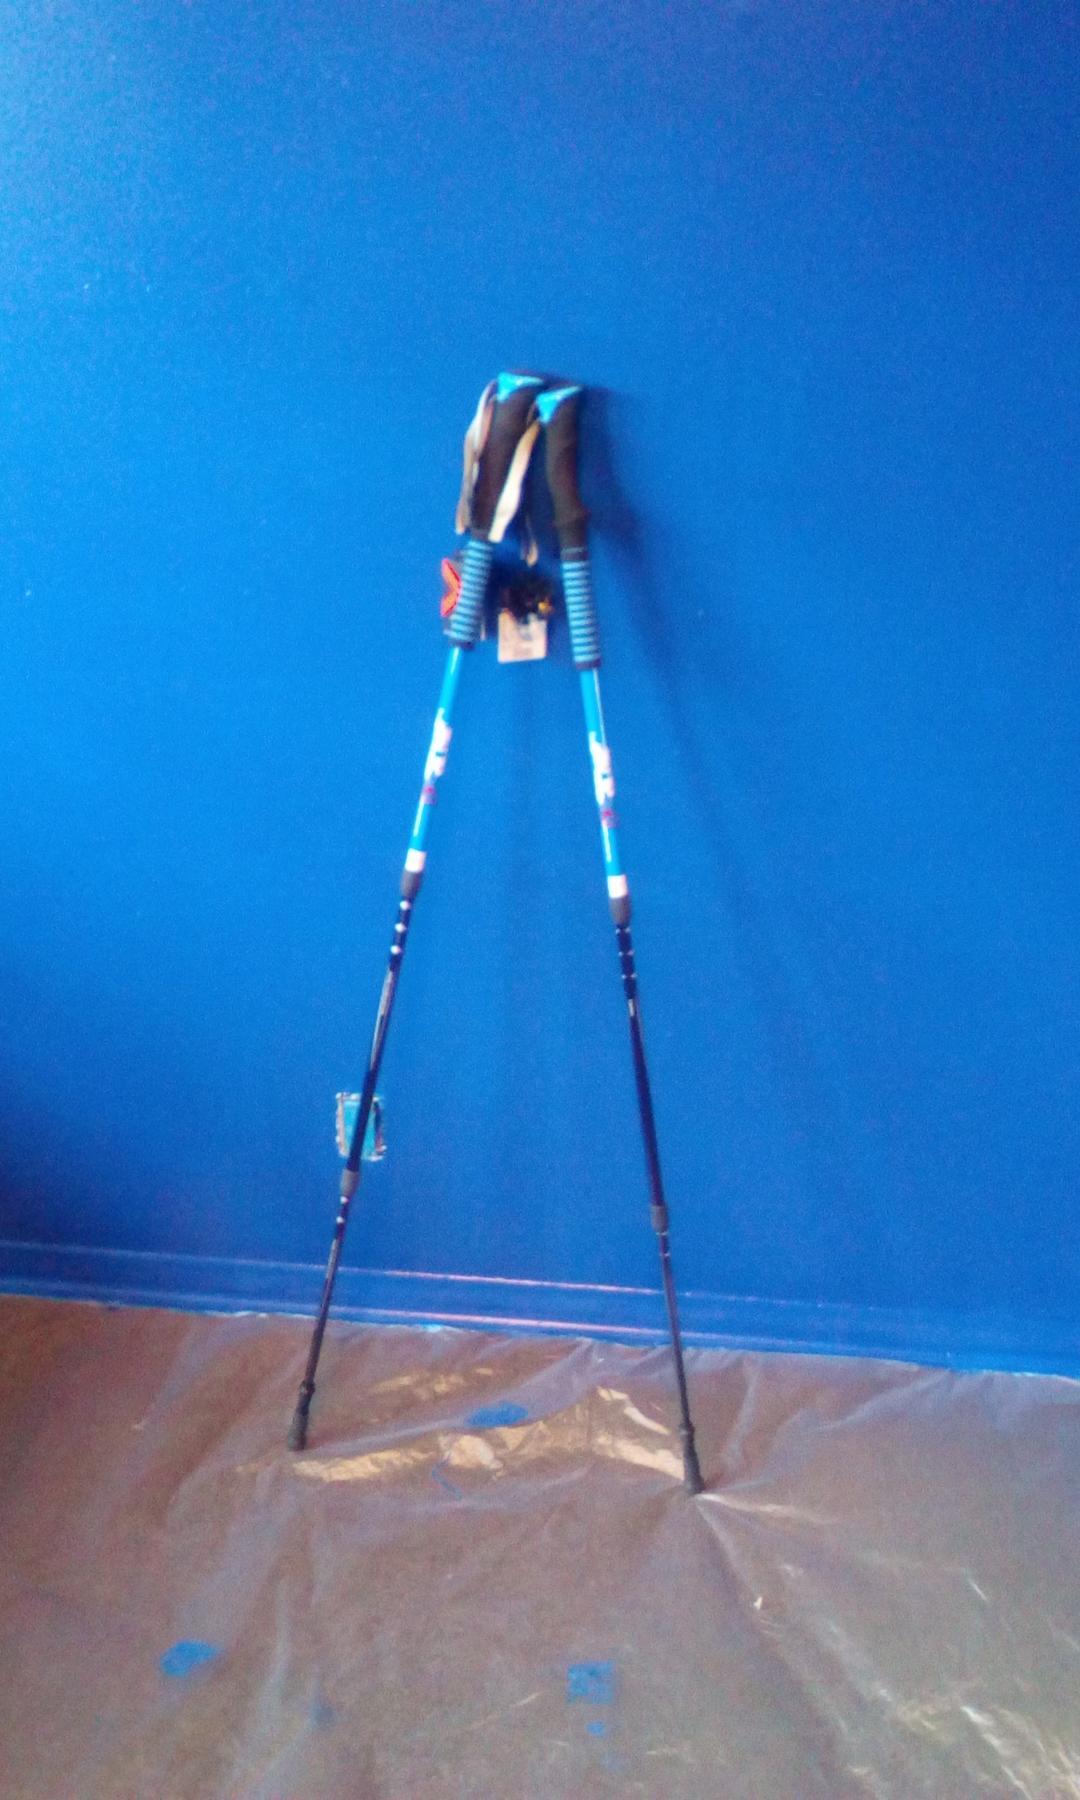 Lightweight adjustable trekking poles